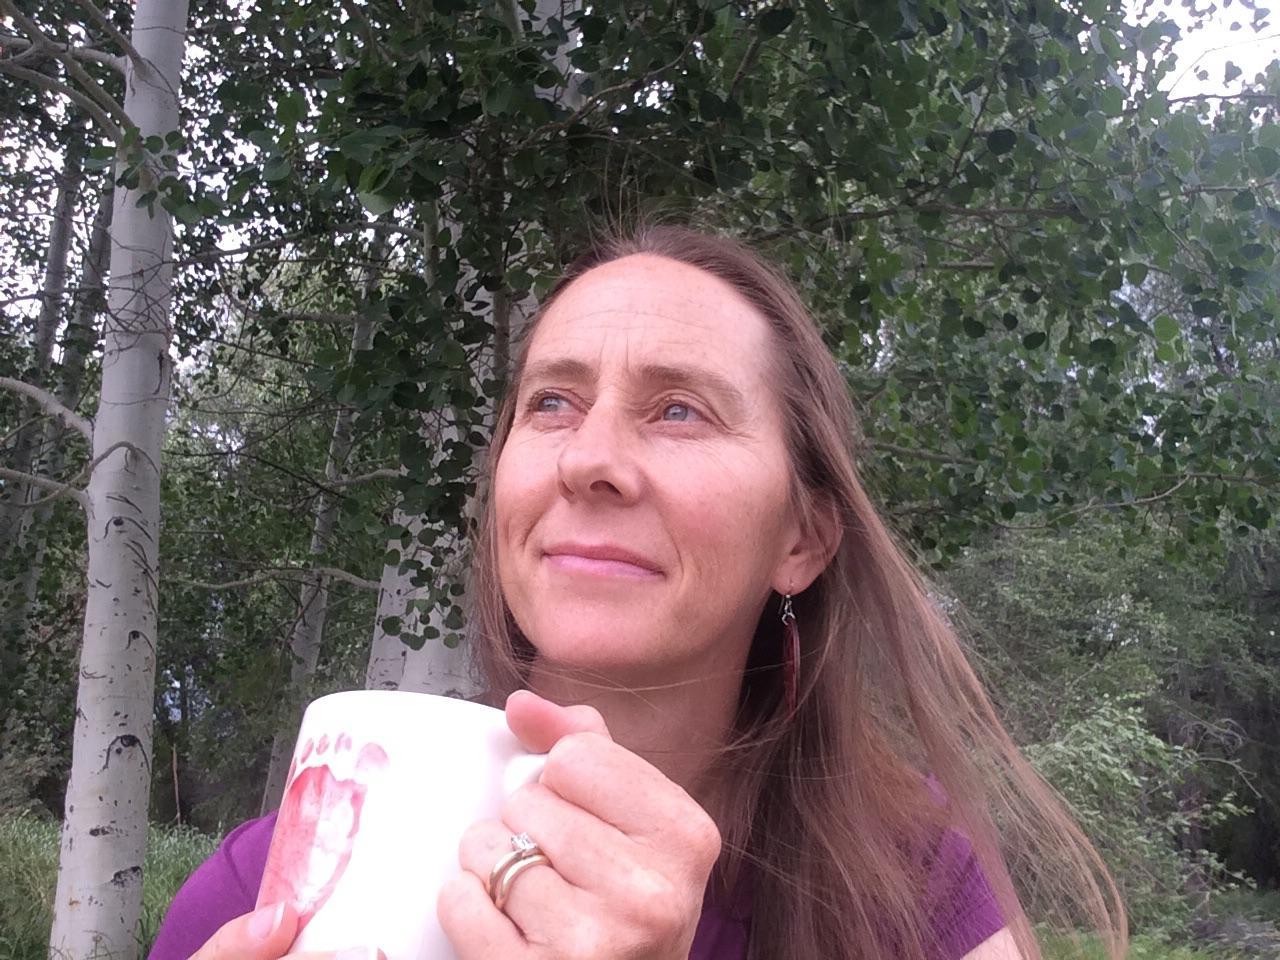 Britta Hubbard / Heartmanity Contributor